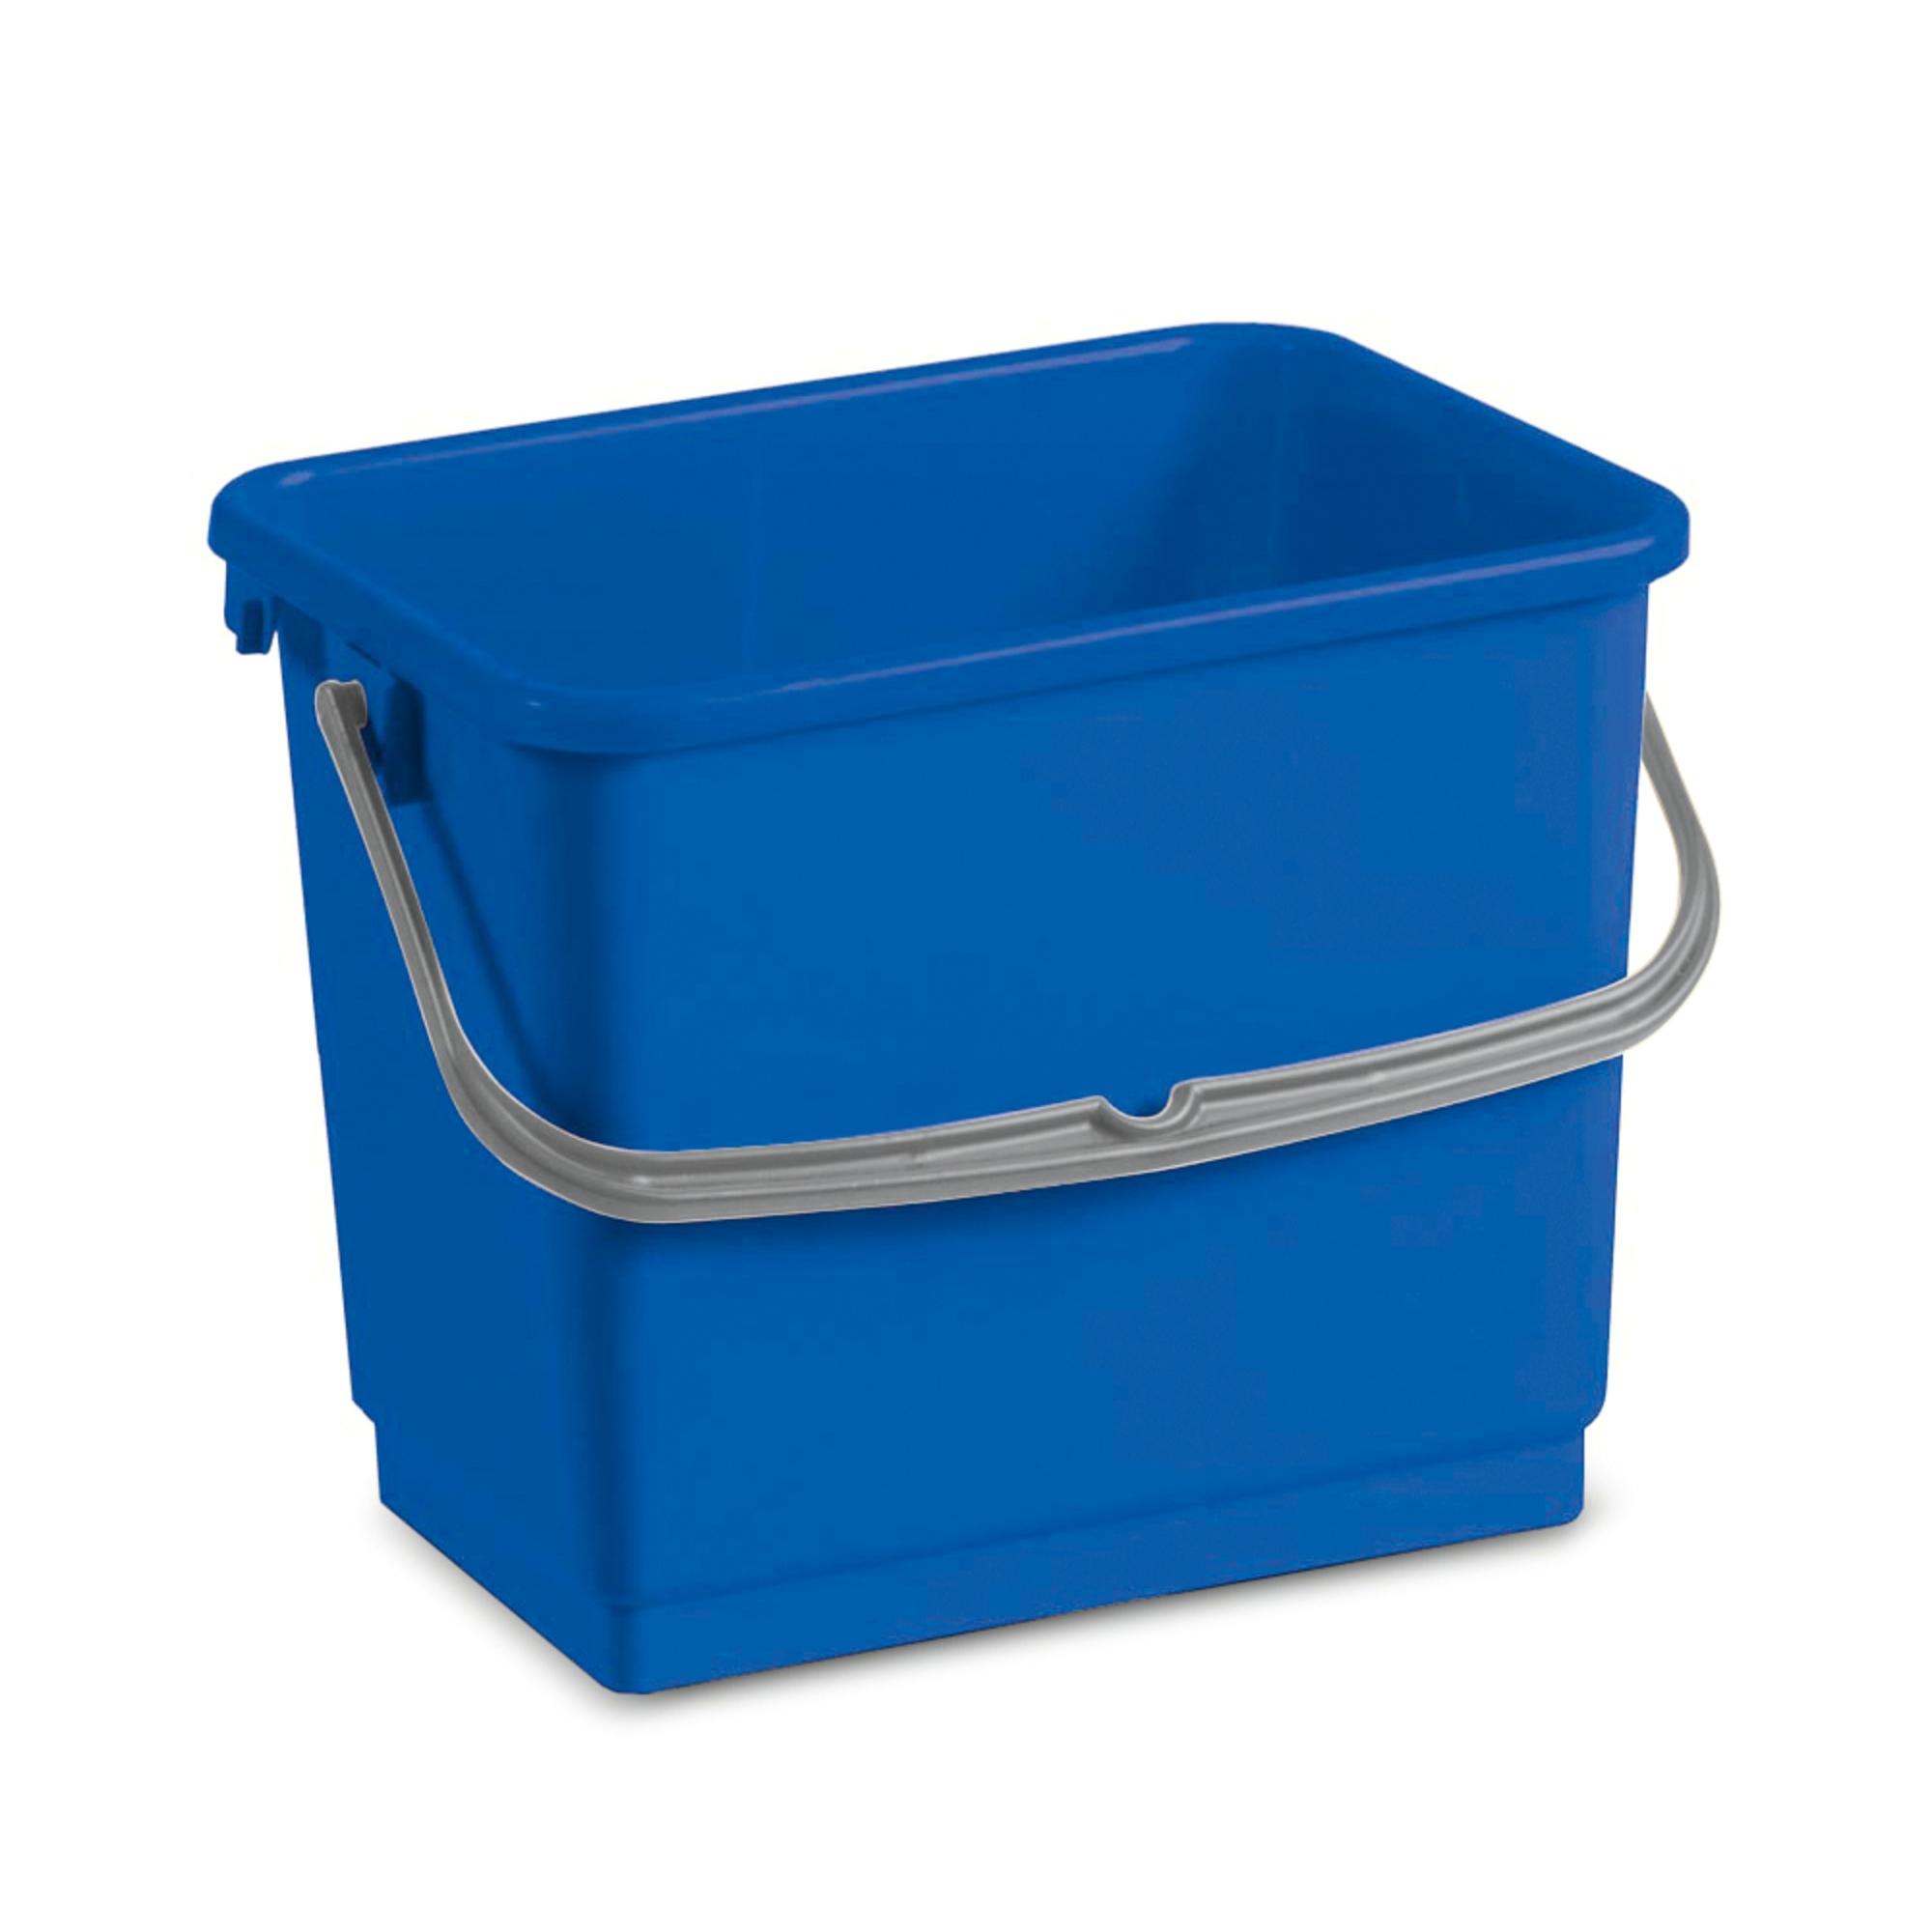 Eimer blau 4 Liter